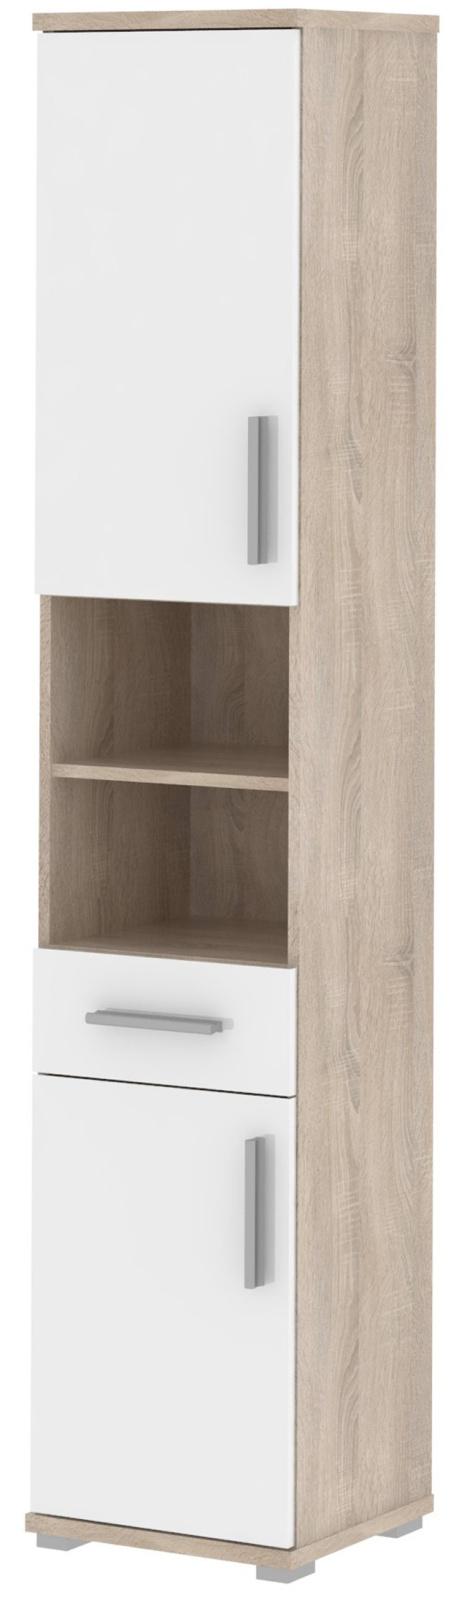 LINDA, skříňka vysoká LI05, dub sonoma/bílý lesk